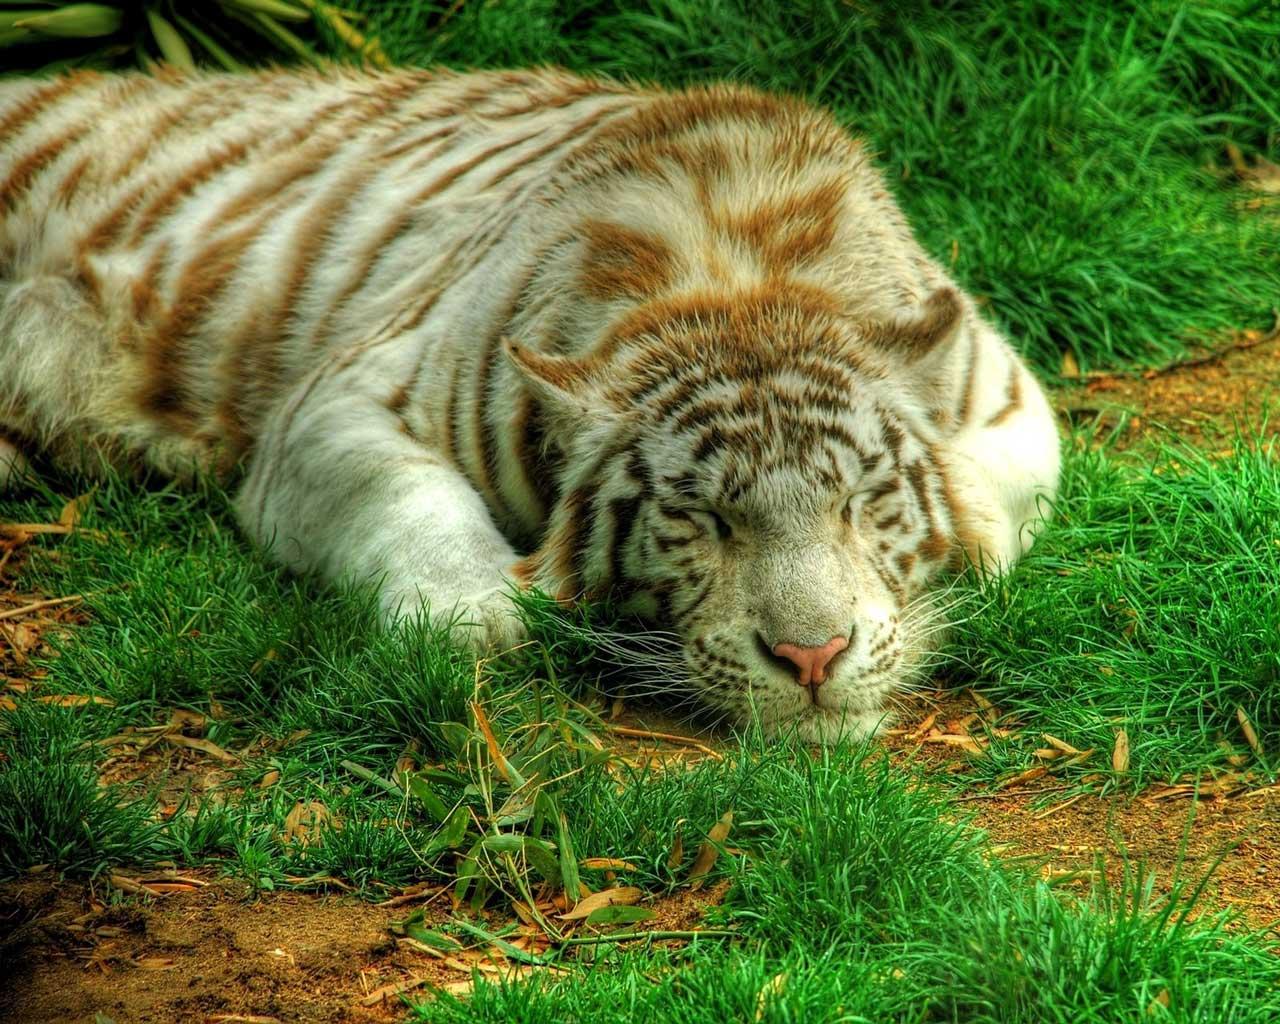 Картинка персидский тигр на компьютер, картинки и новые обои.: http://famajor.ru/kartinka_persidskiij_tigr_kompjuter-7183.php